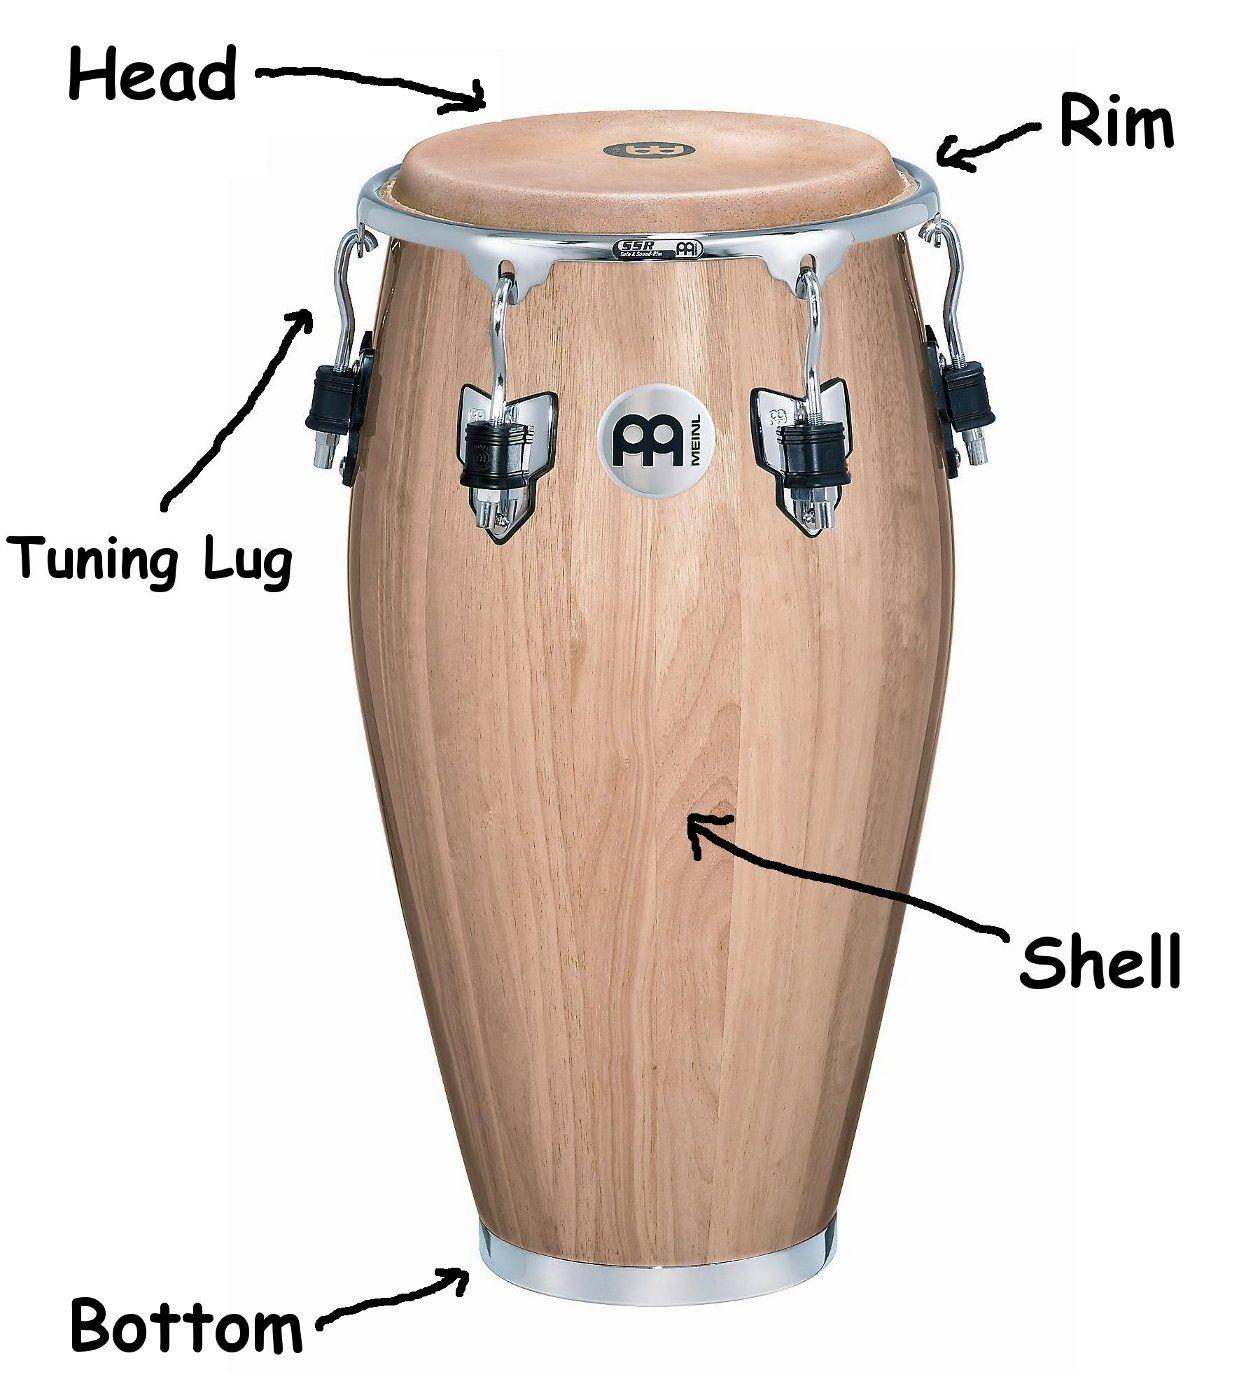 Percussion Conga Anatomy Hobbies Pinterest Congas